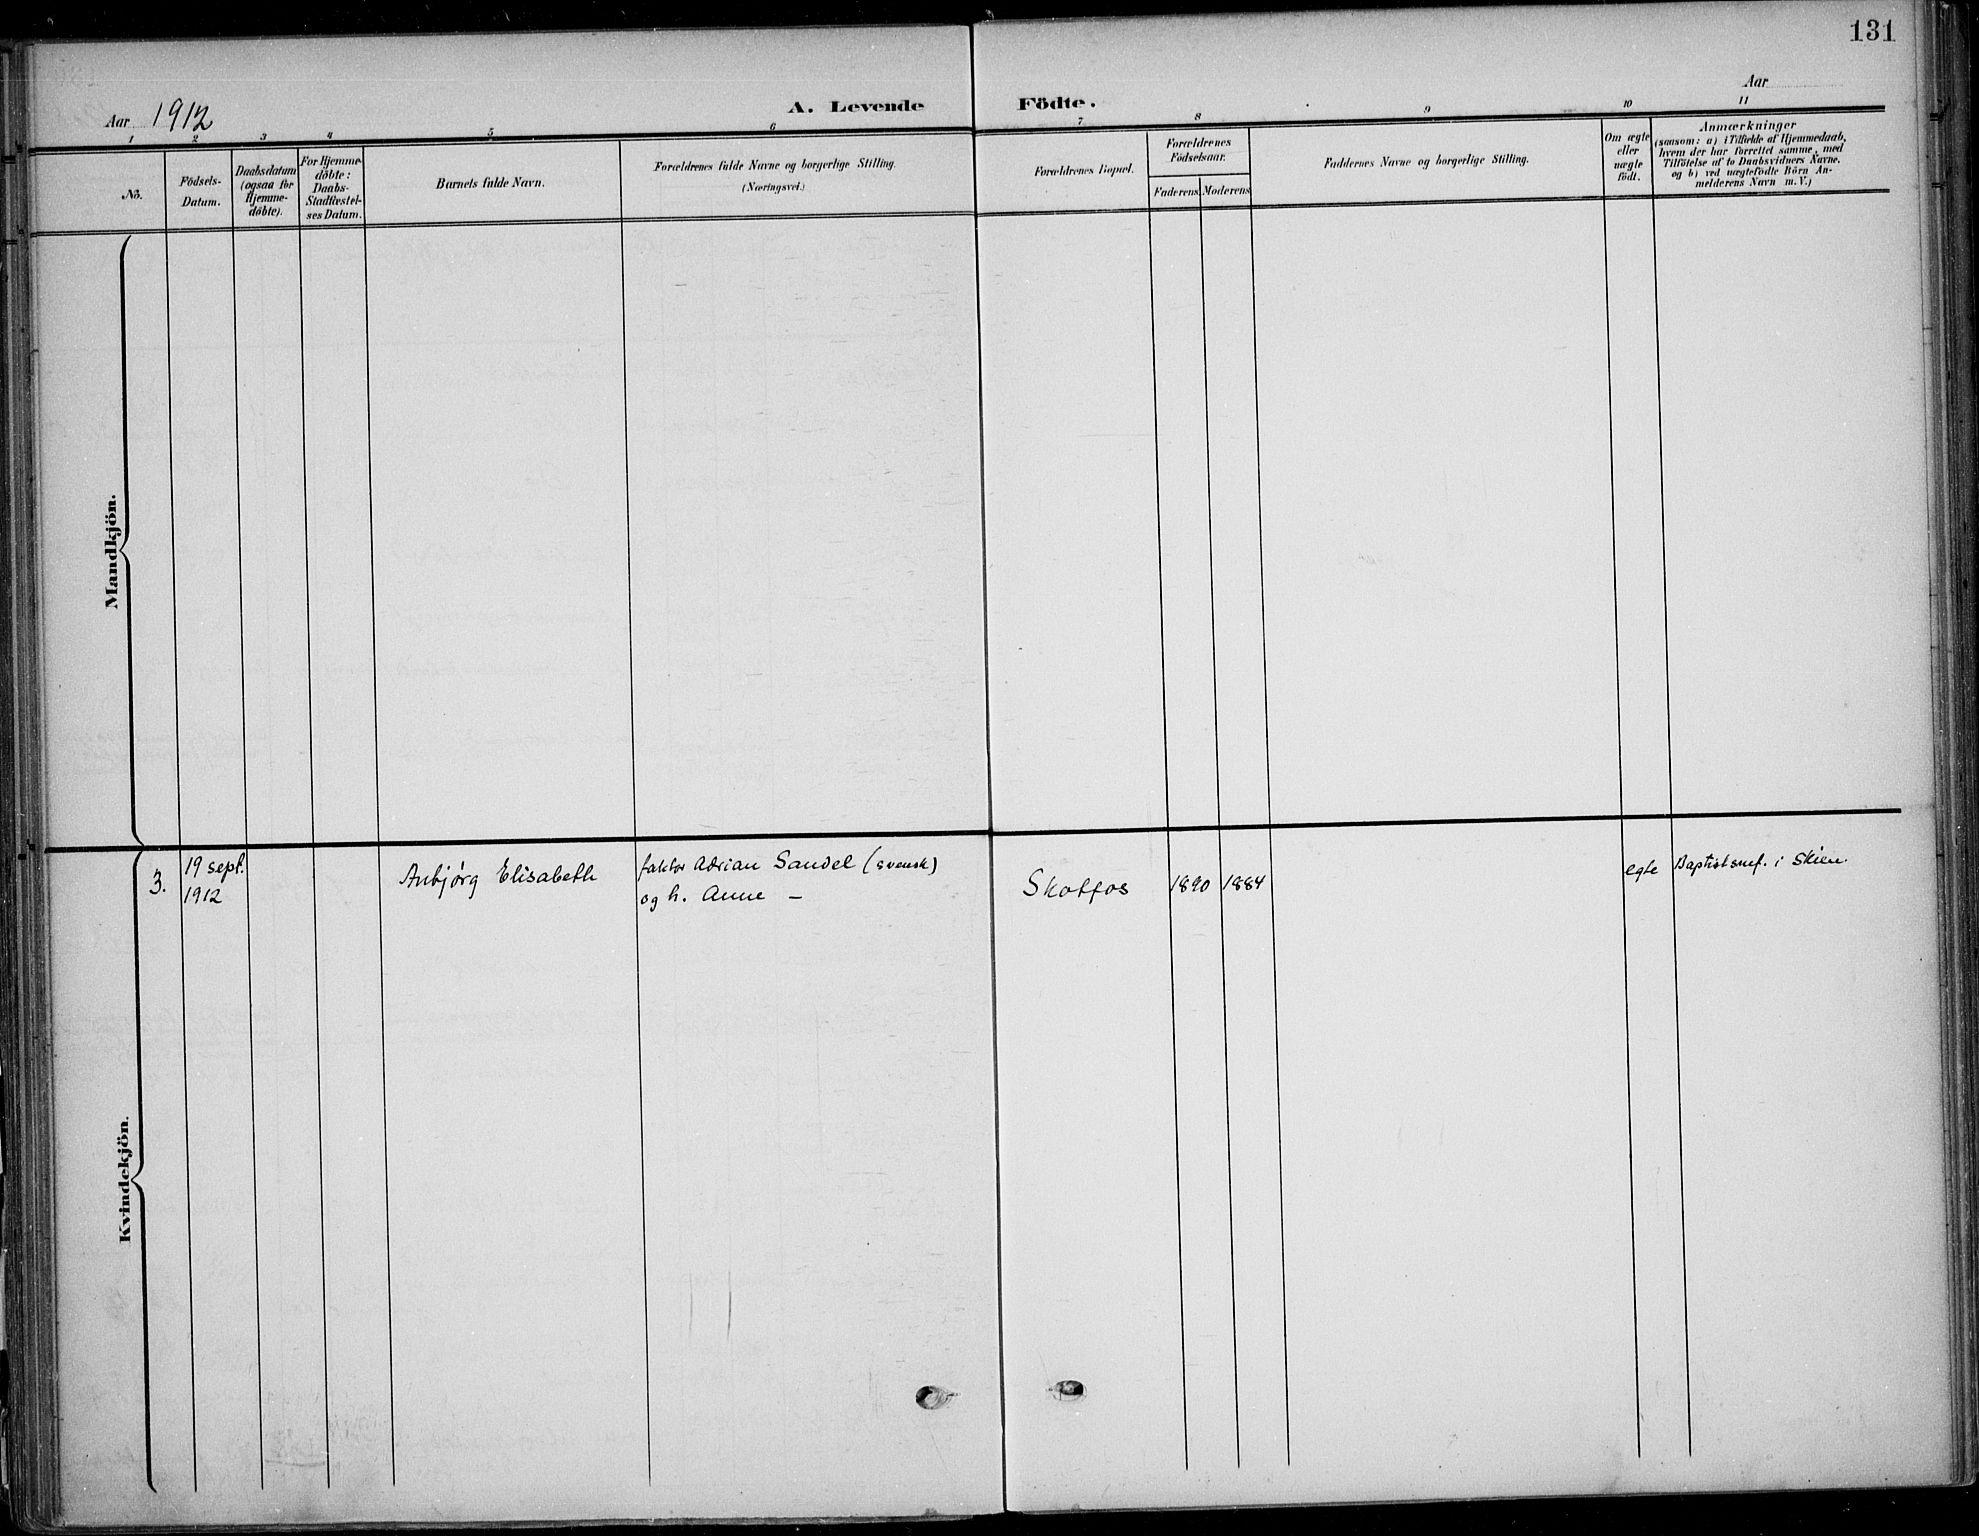 SAKO, Solum kirkebøker, F/Fb/L0003: Ministerialbok nr. II 3, 1901-1912, s. 131